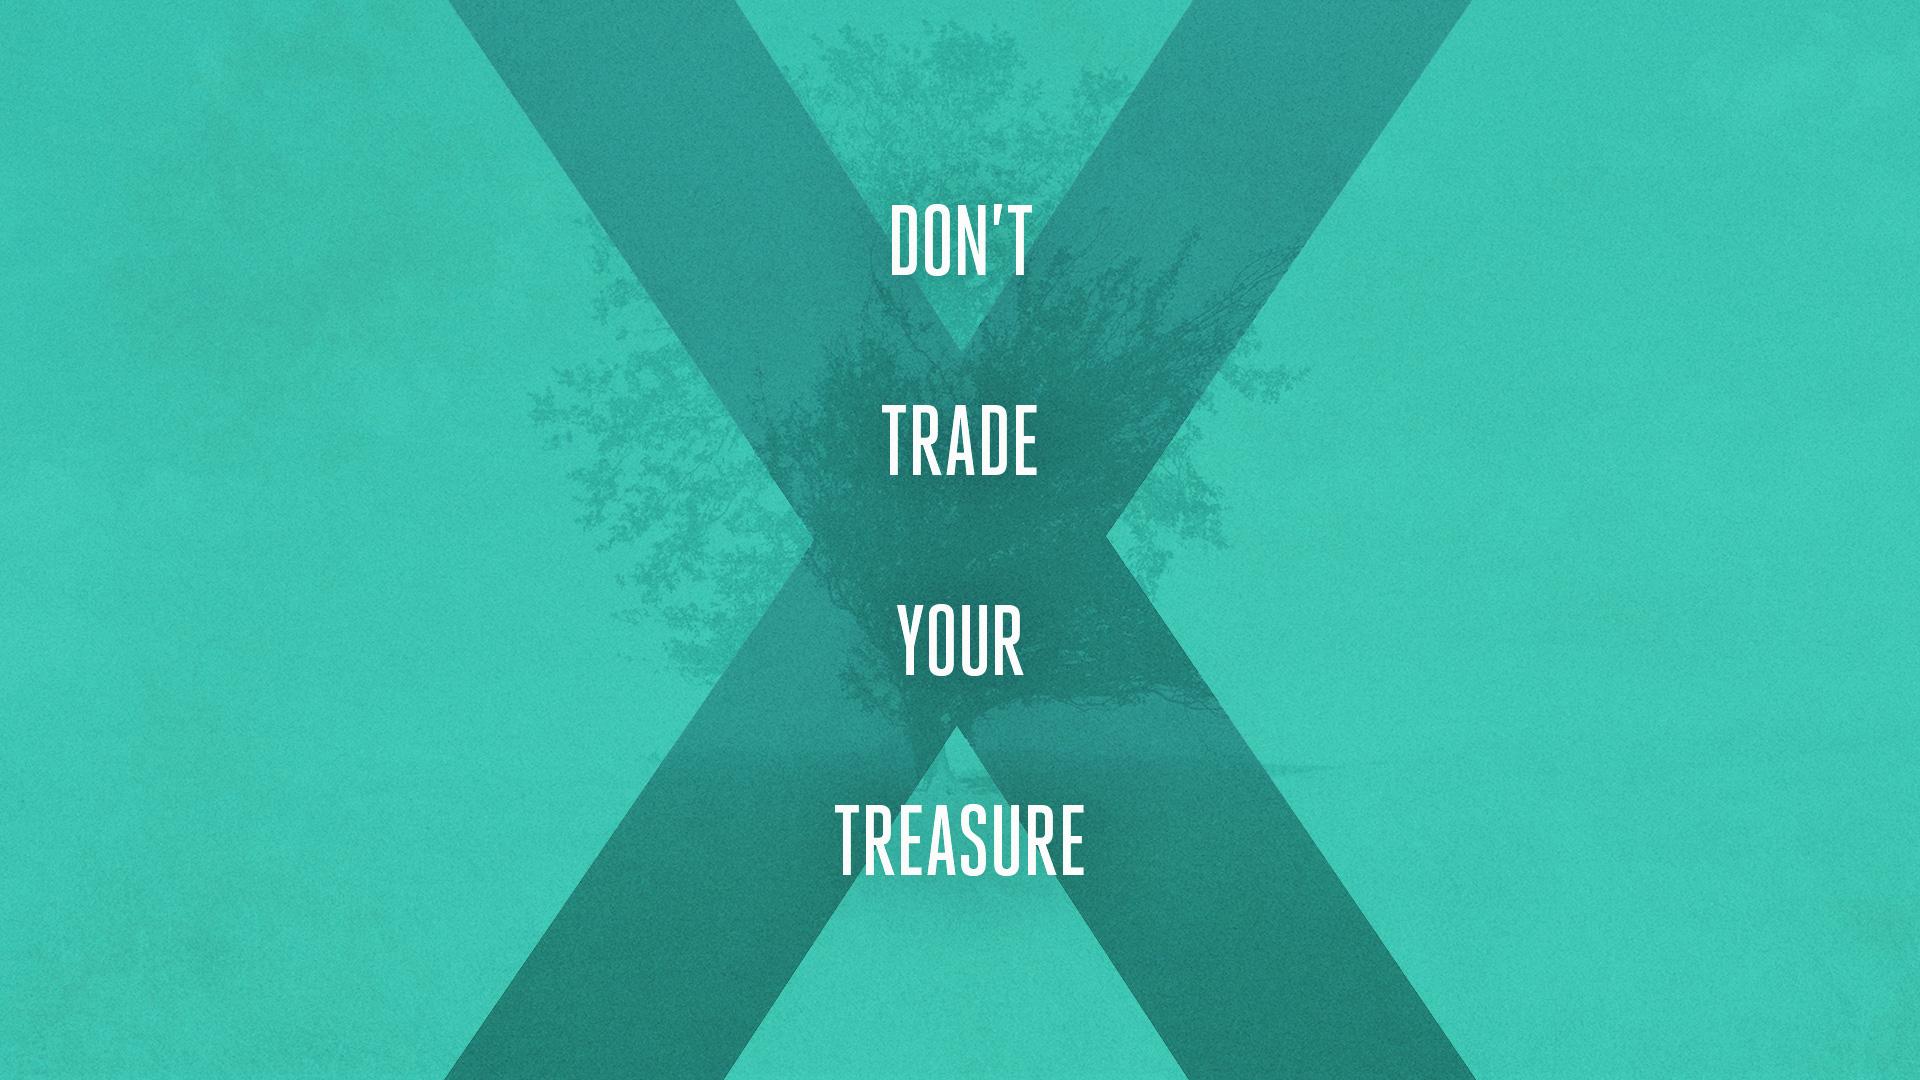 Don't Trade Your Treasure